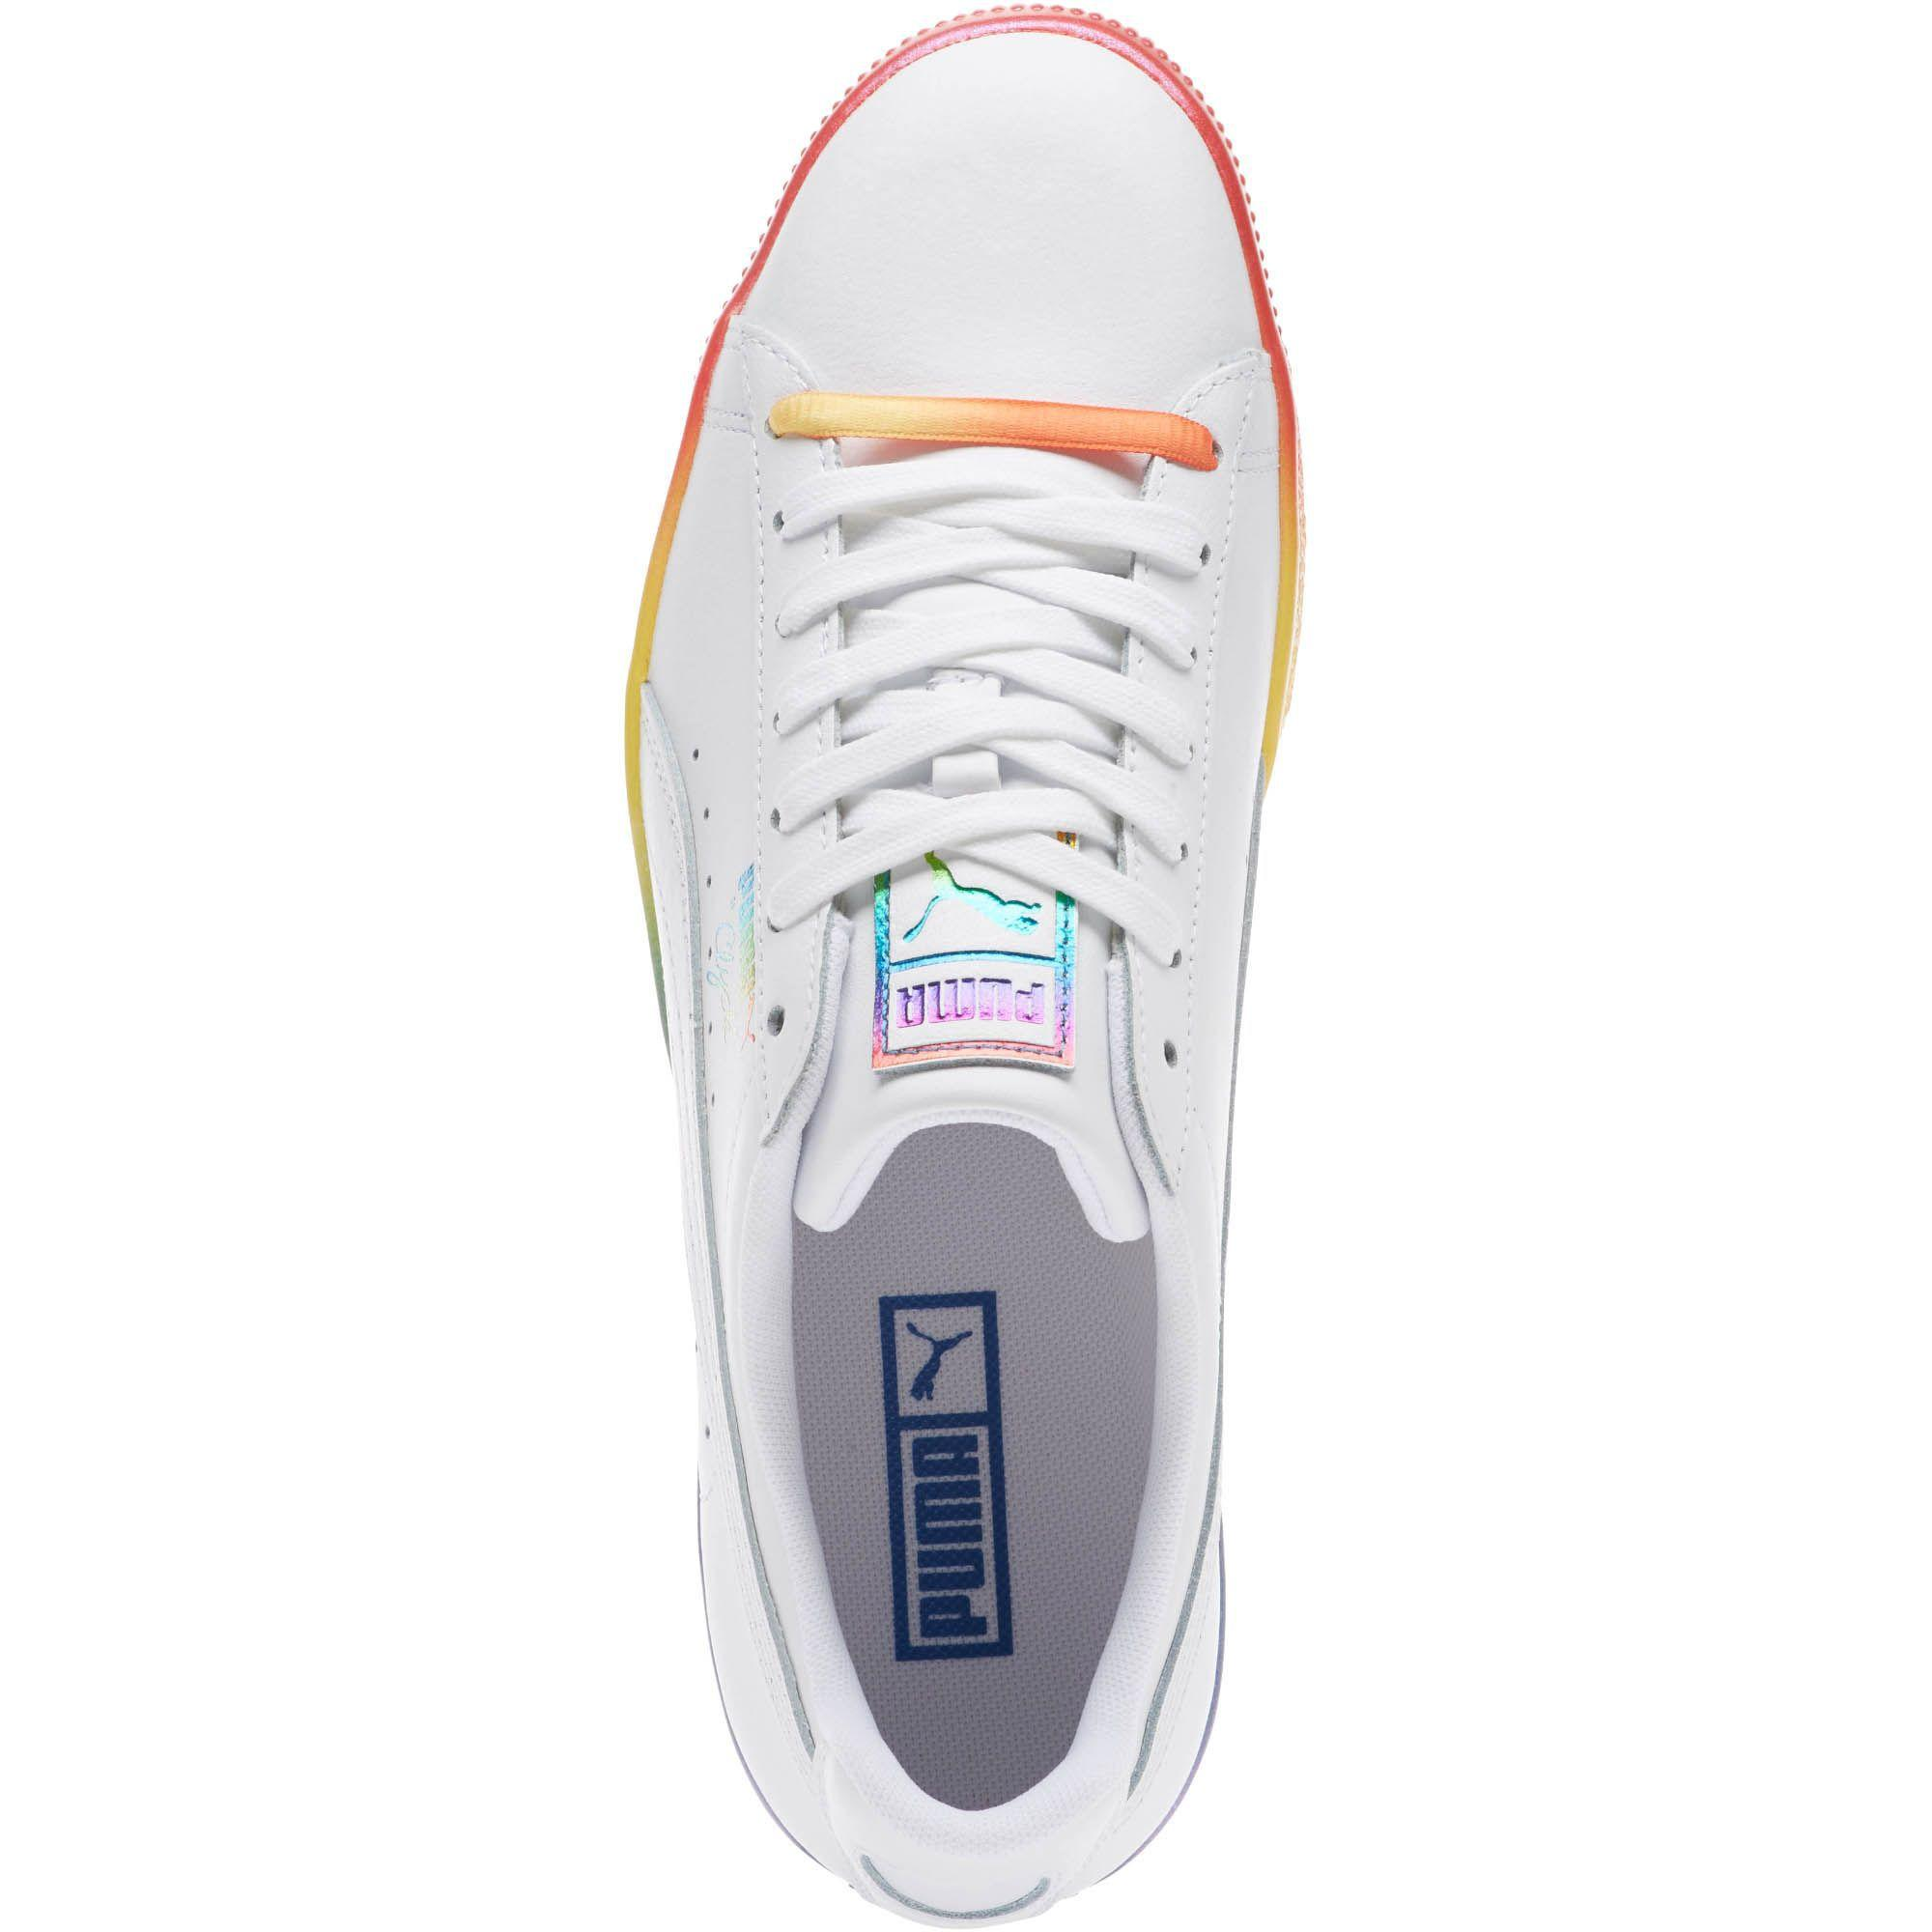 59386c45dd1 Lyst - PUMA Clyde Pride Sneakers in White